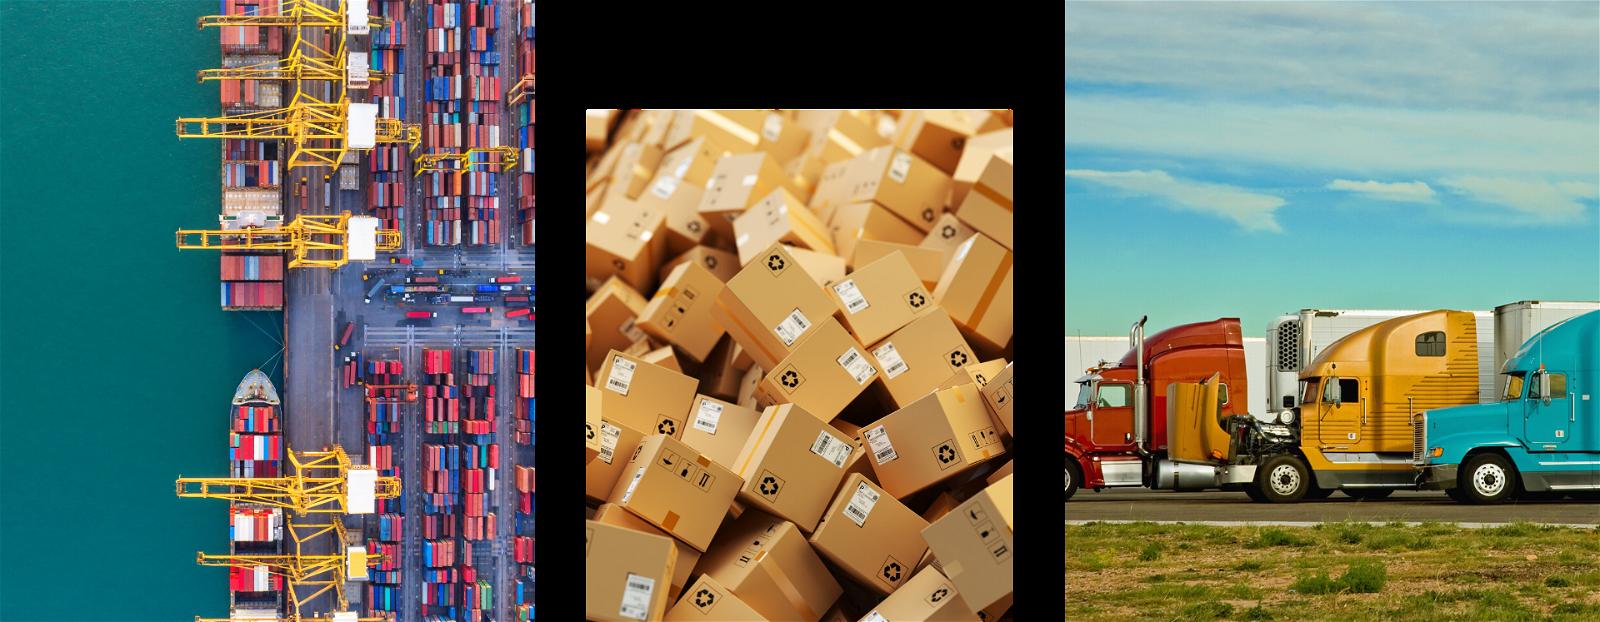 Logistics services BPO